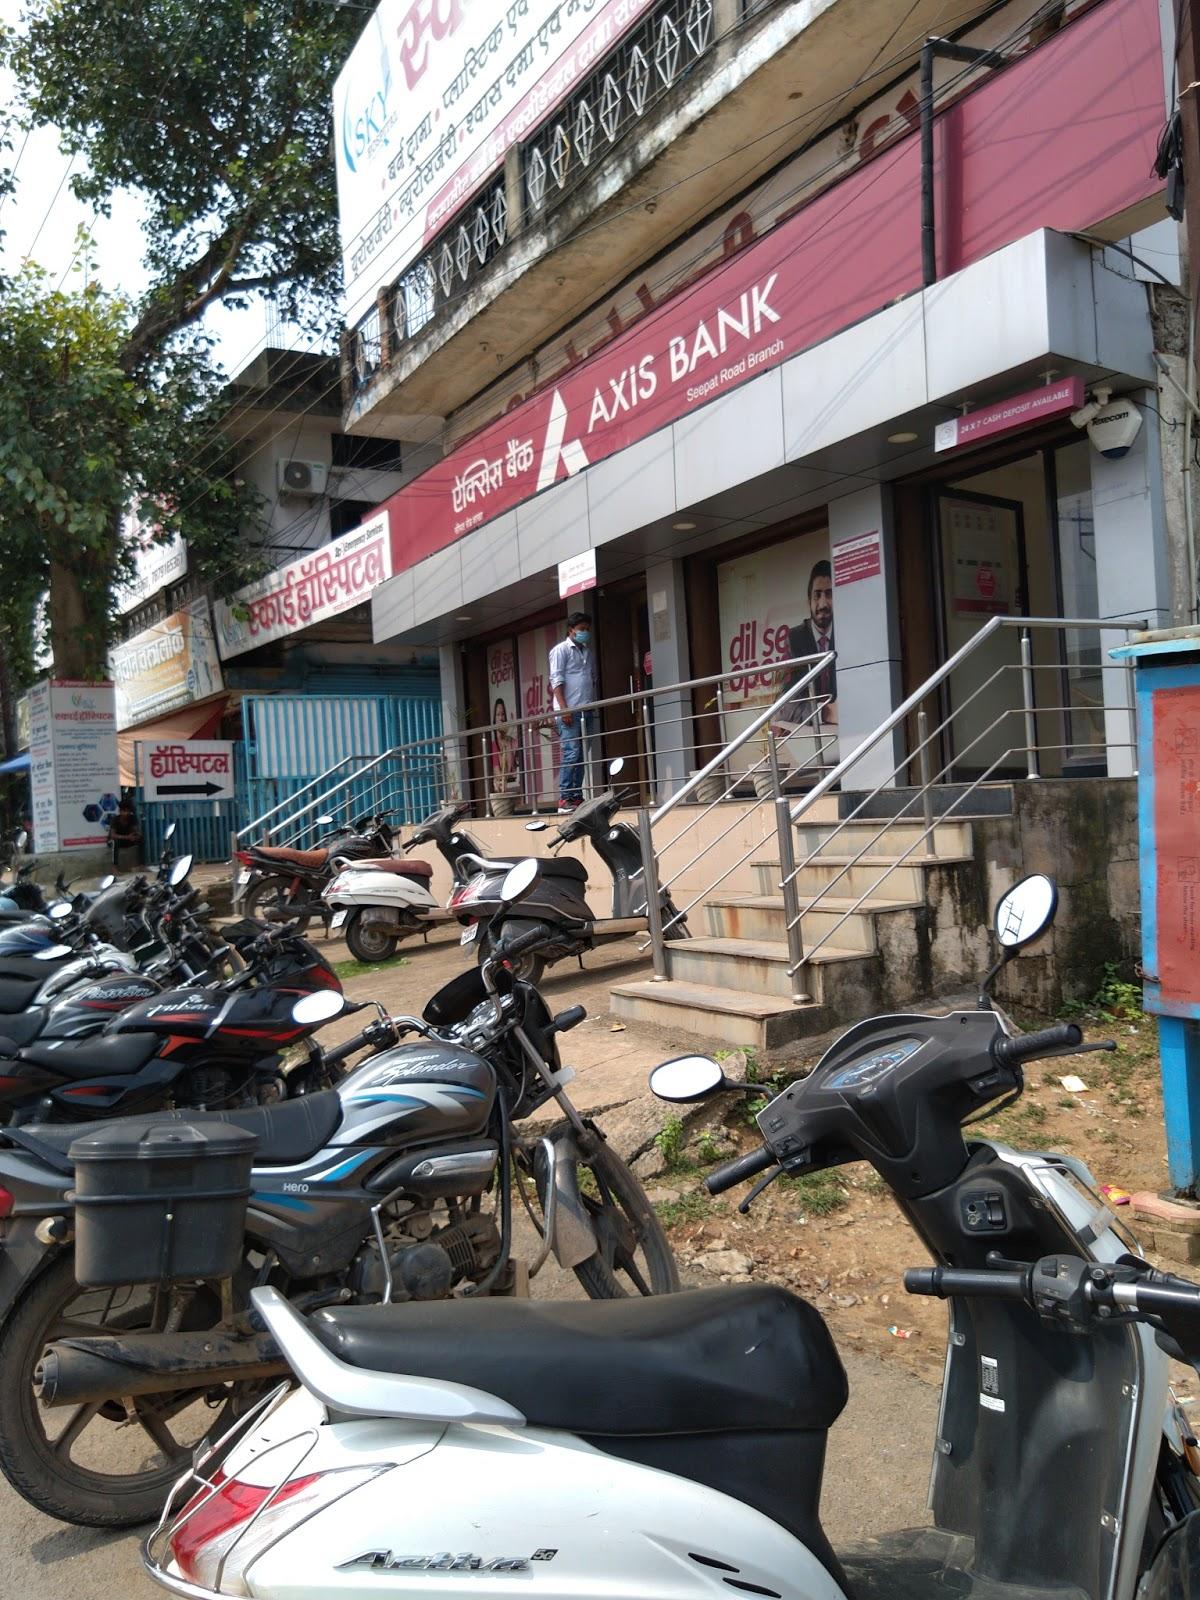 blood bank Axis Bank near Bilaspur Chhattisgarh